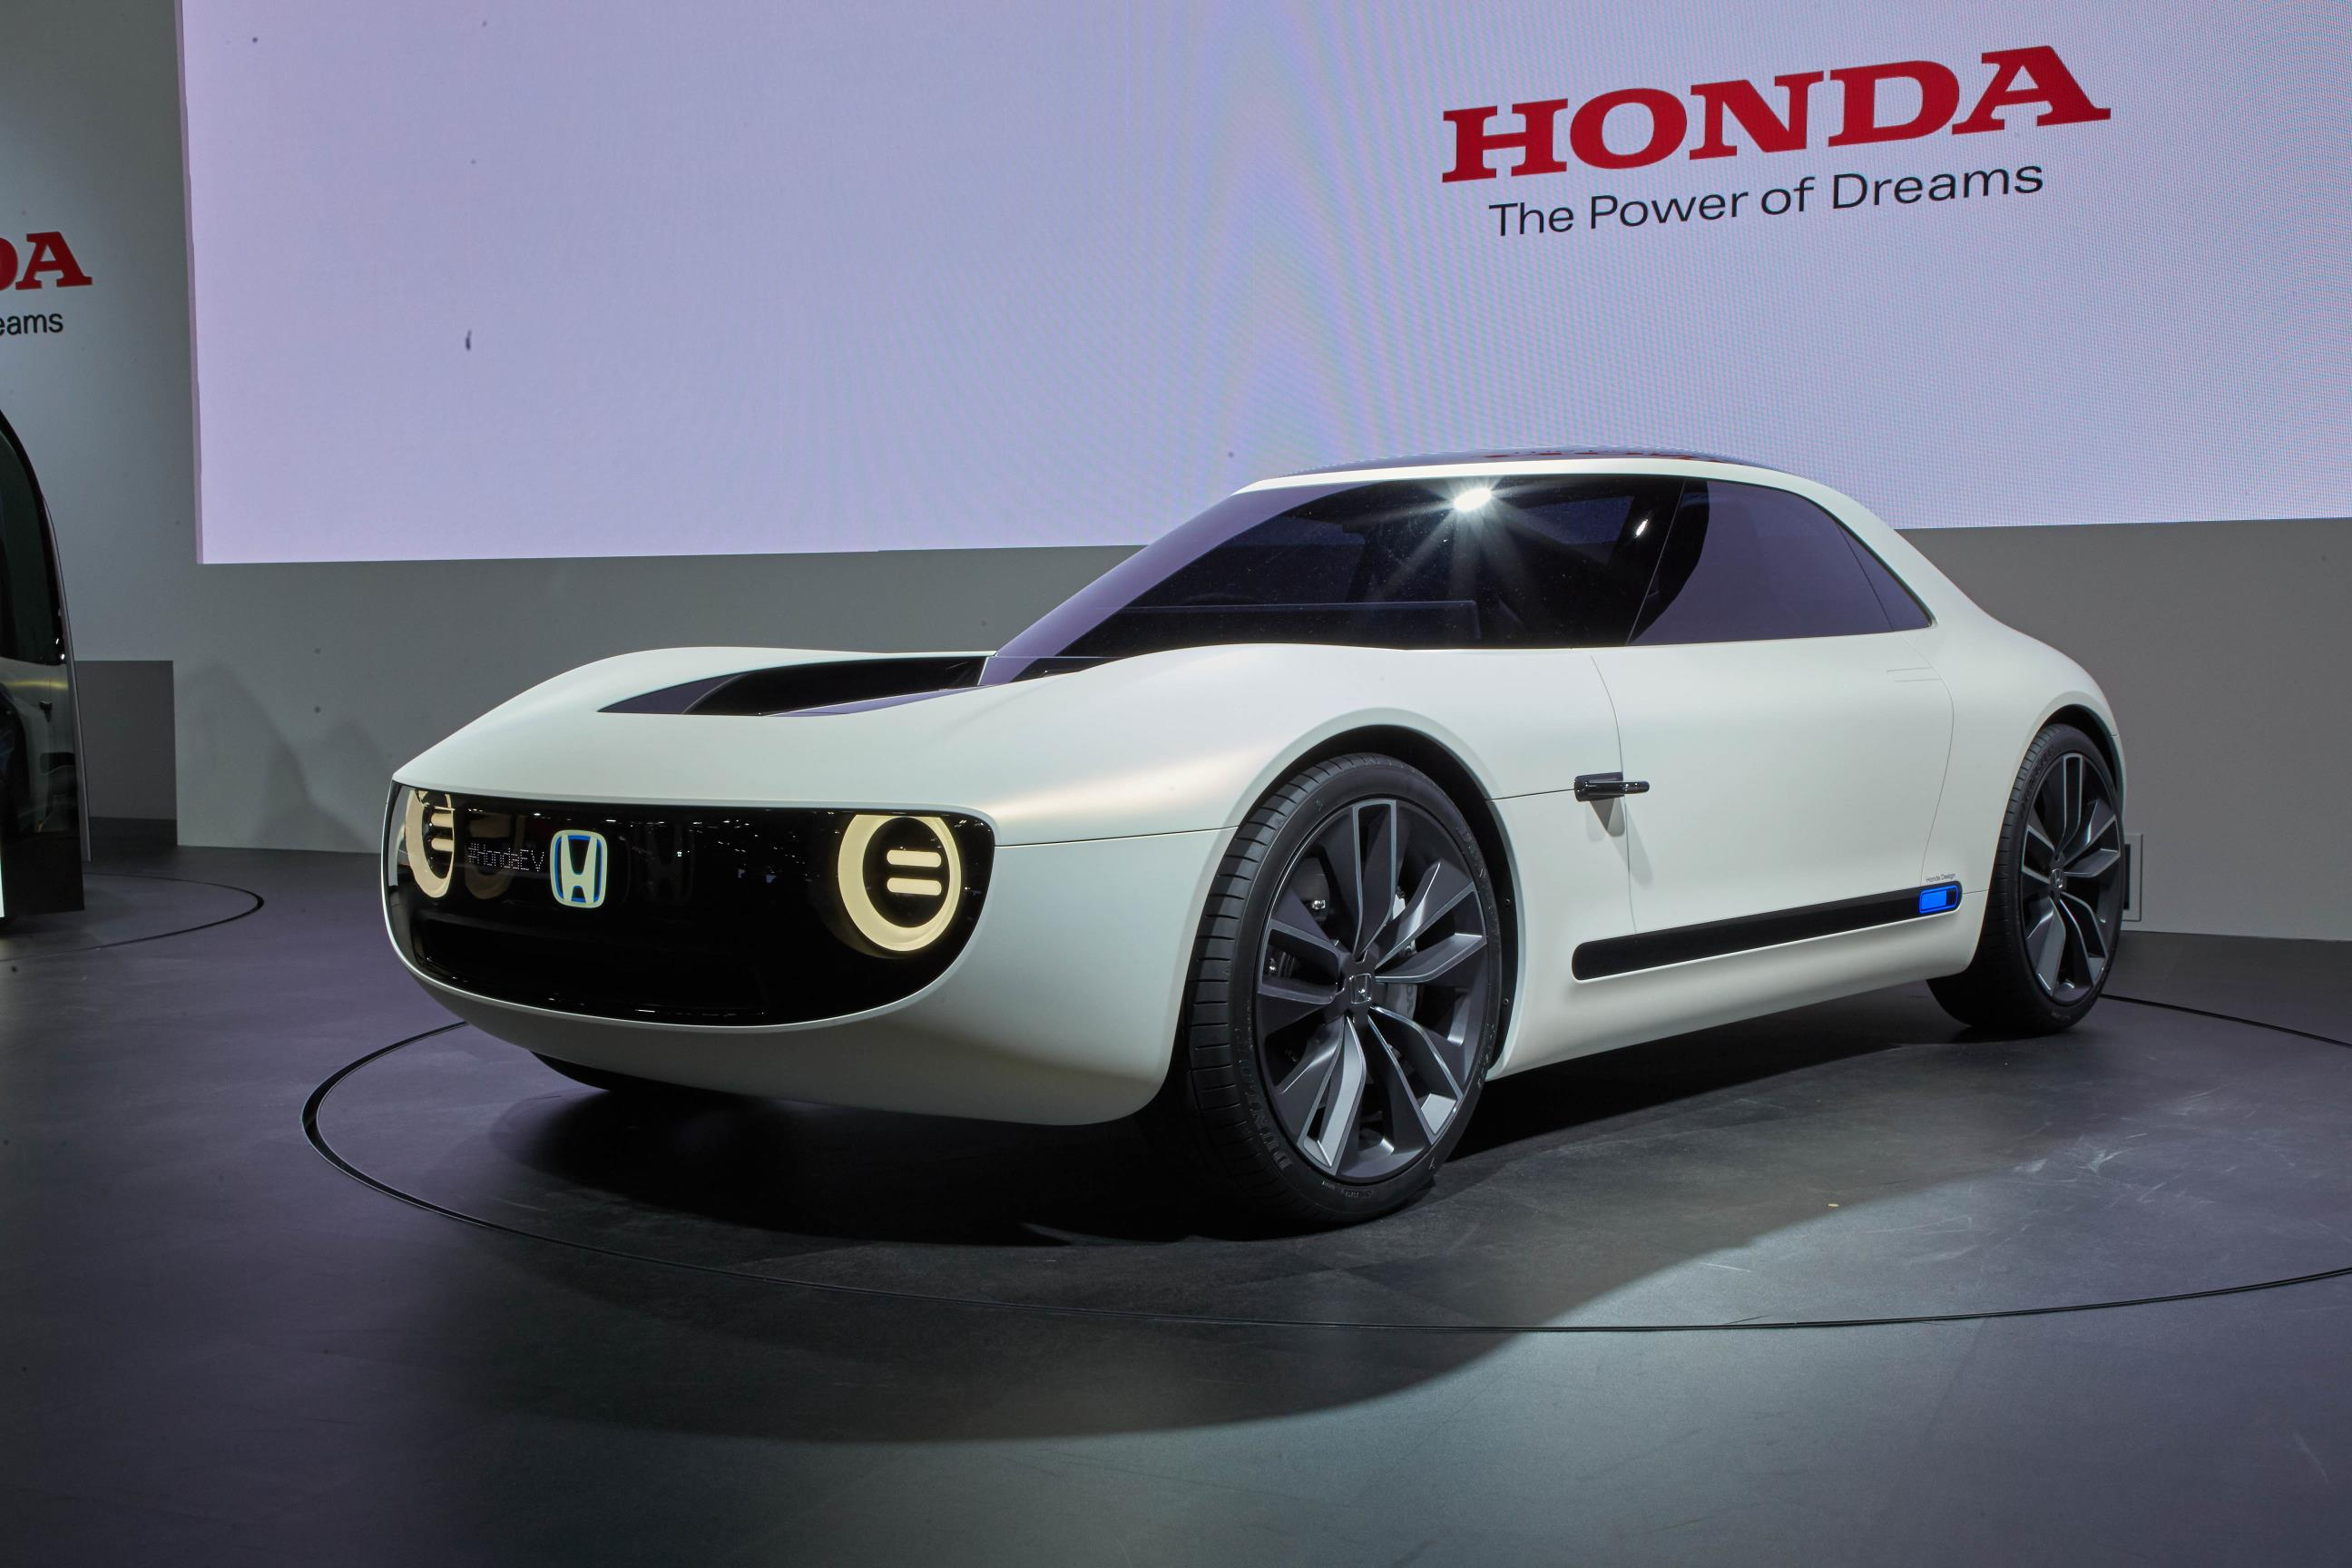 Attractive Honda Sports EV And Urban EV Concepts Reveal Future Retro Japanese Design  ...